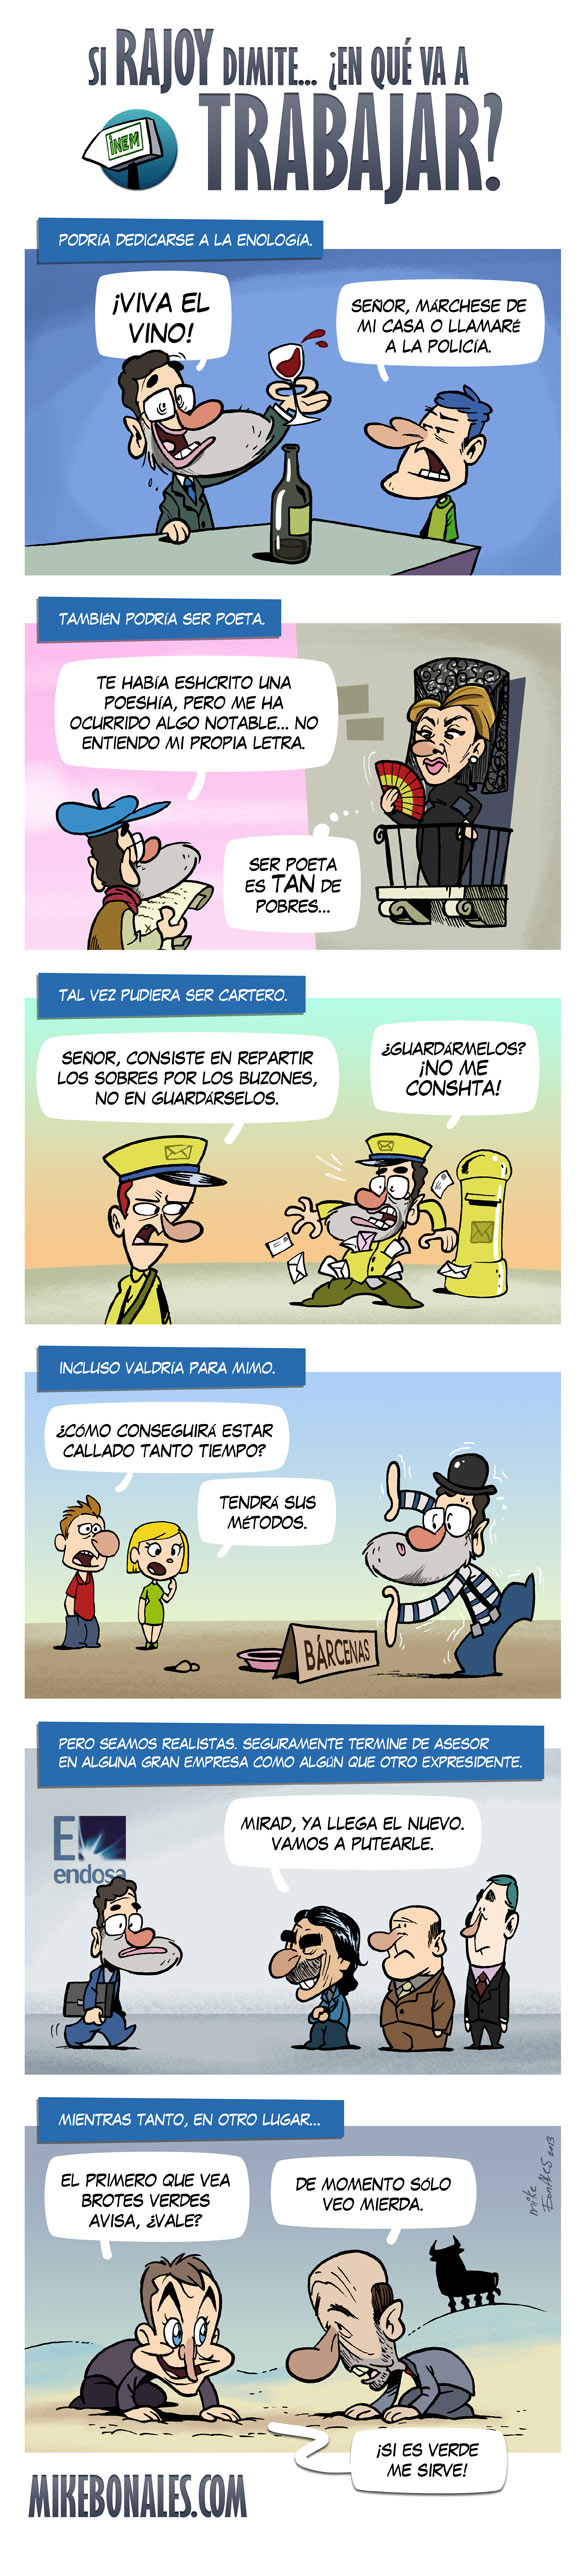 Si Rajoy dimite, ¿en qué va a trabajar?